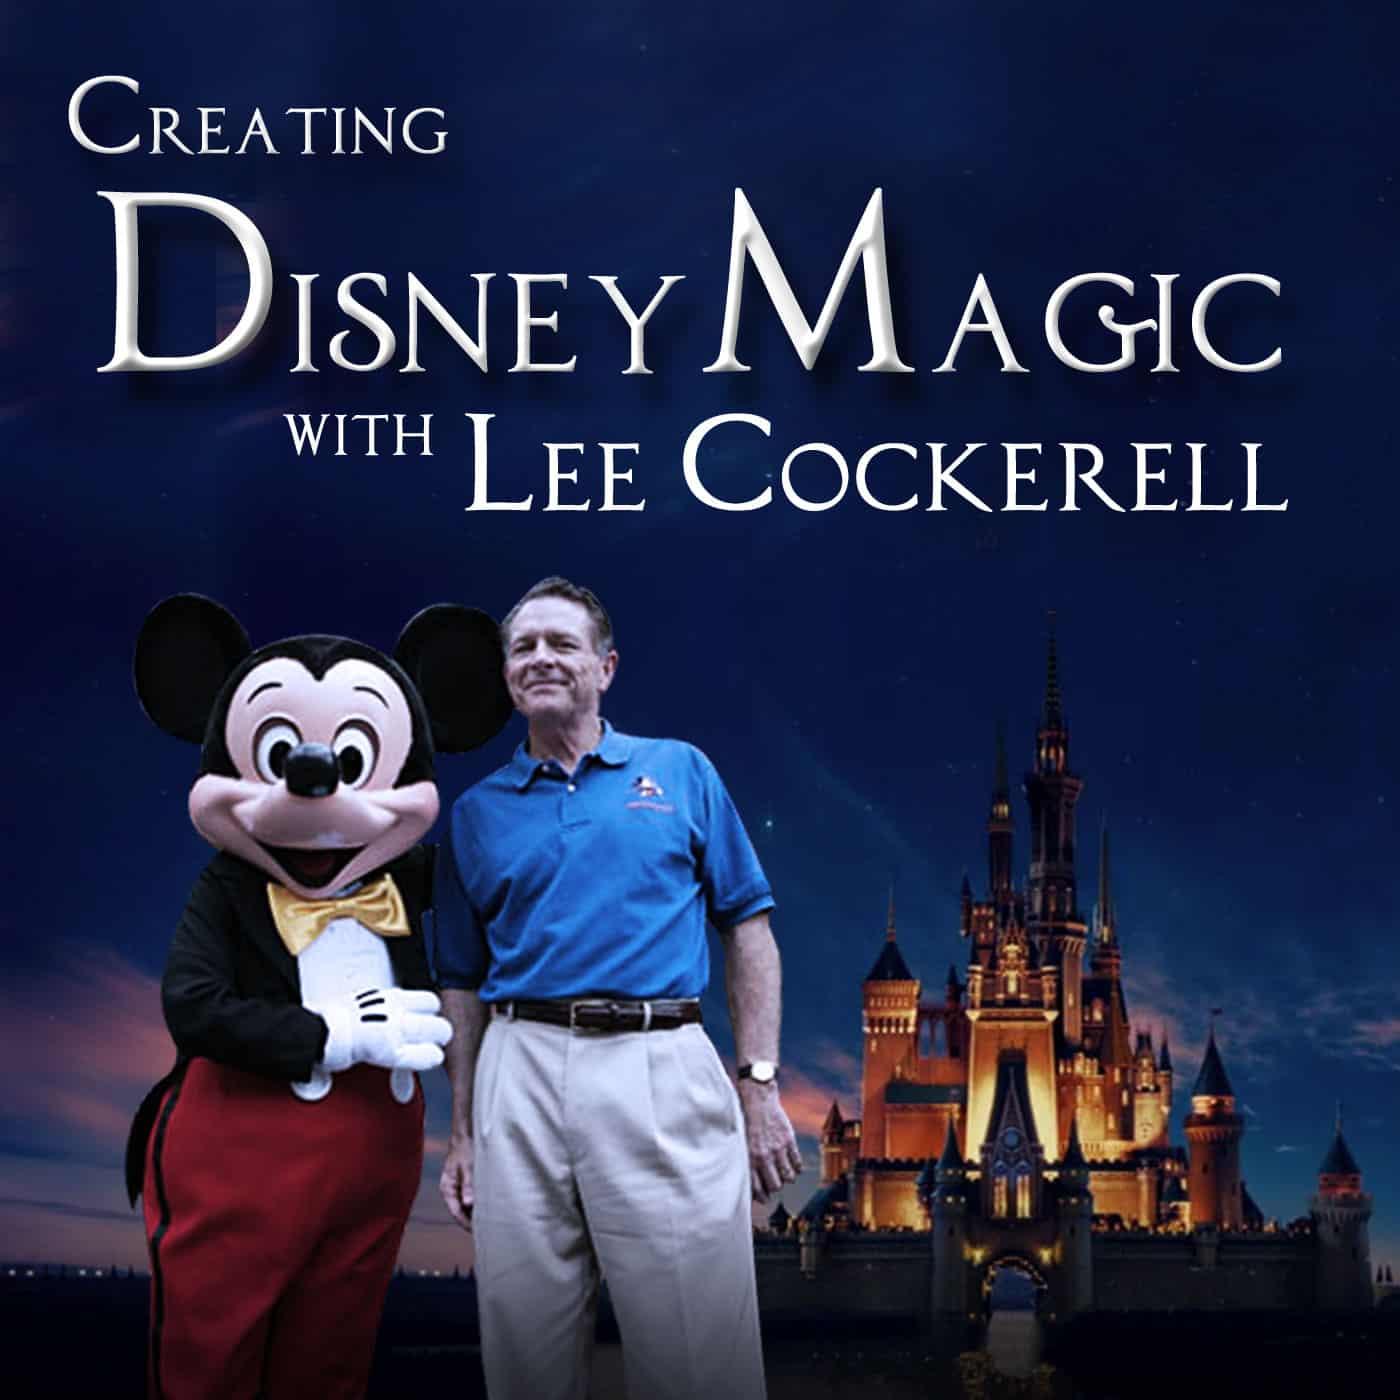 Lee Cockerell Disney World interview